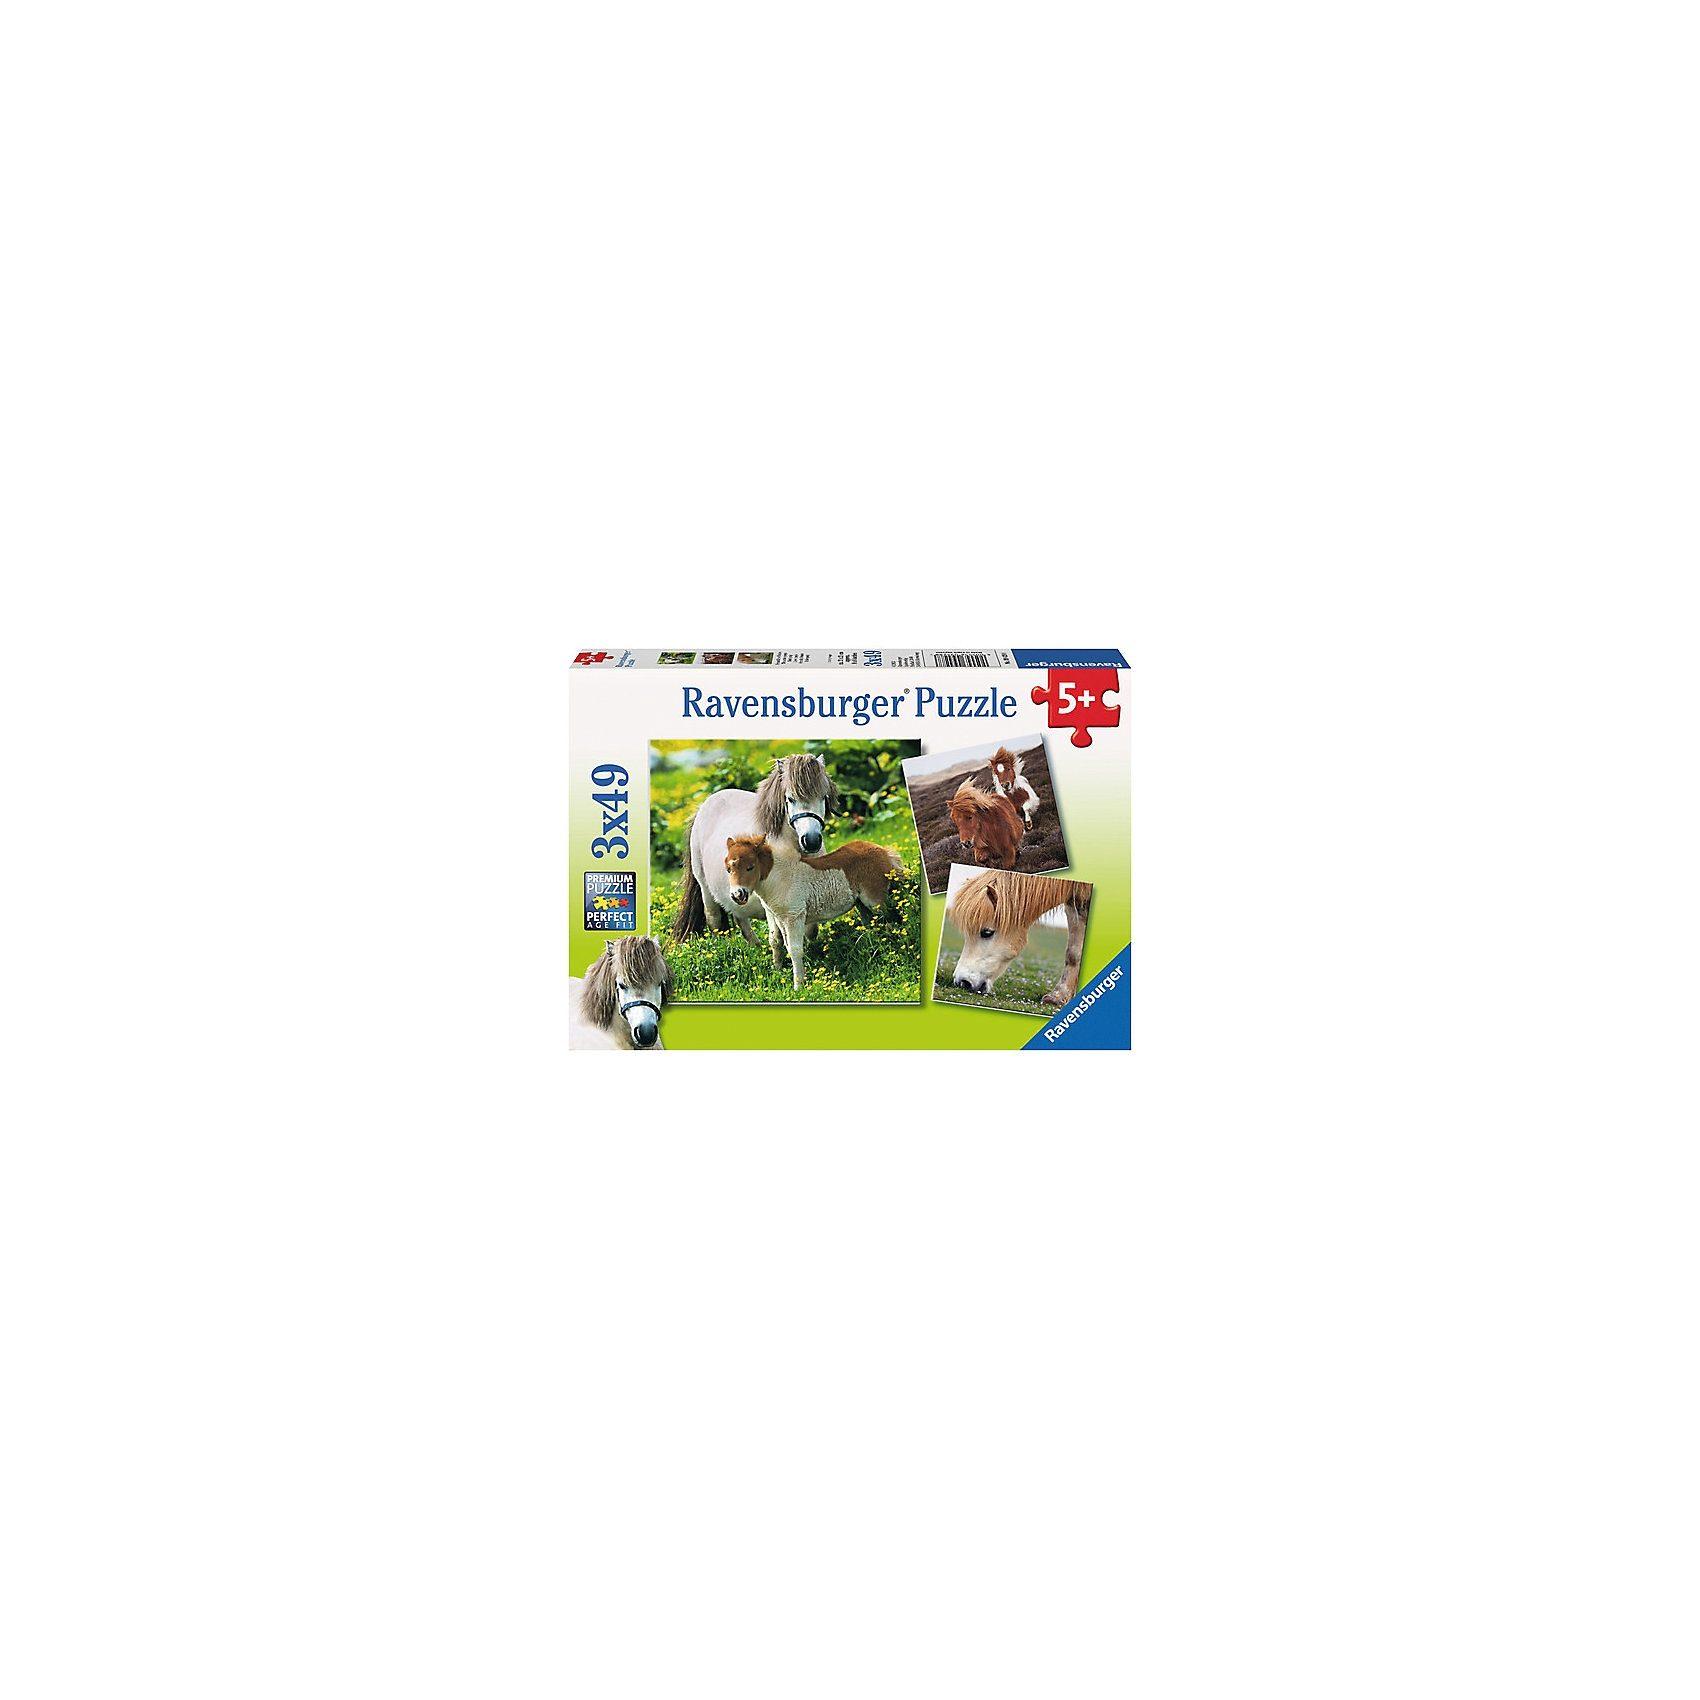 Ravensburger Puzzleset 3 x 49 Teile - Freundliche Ponys